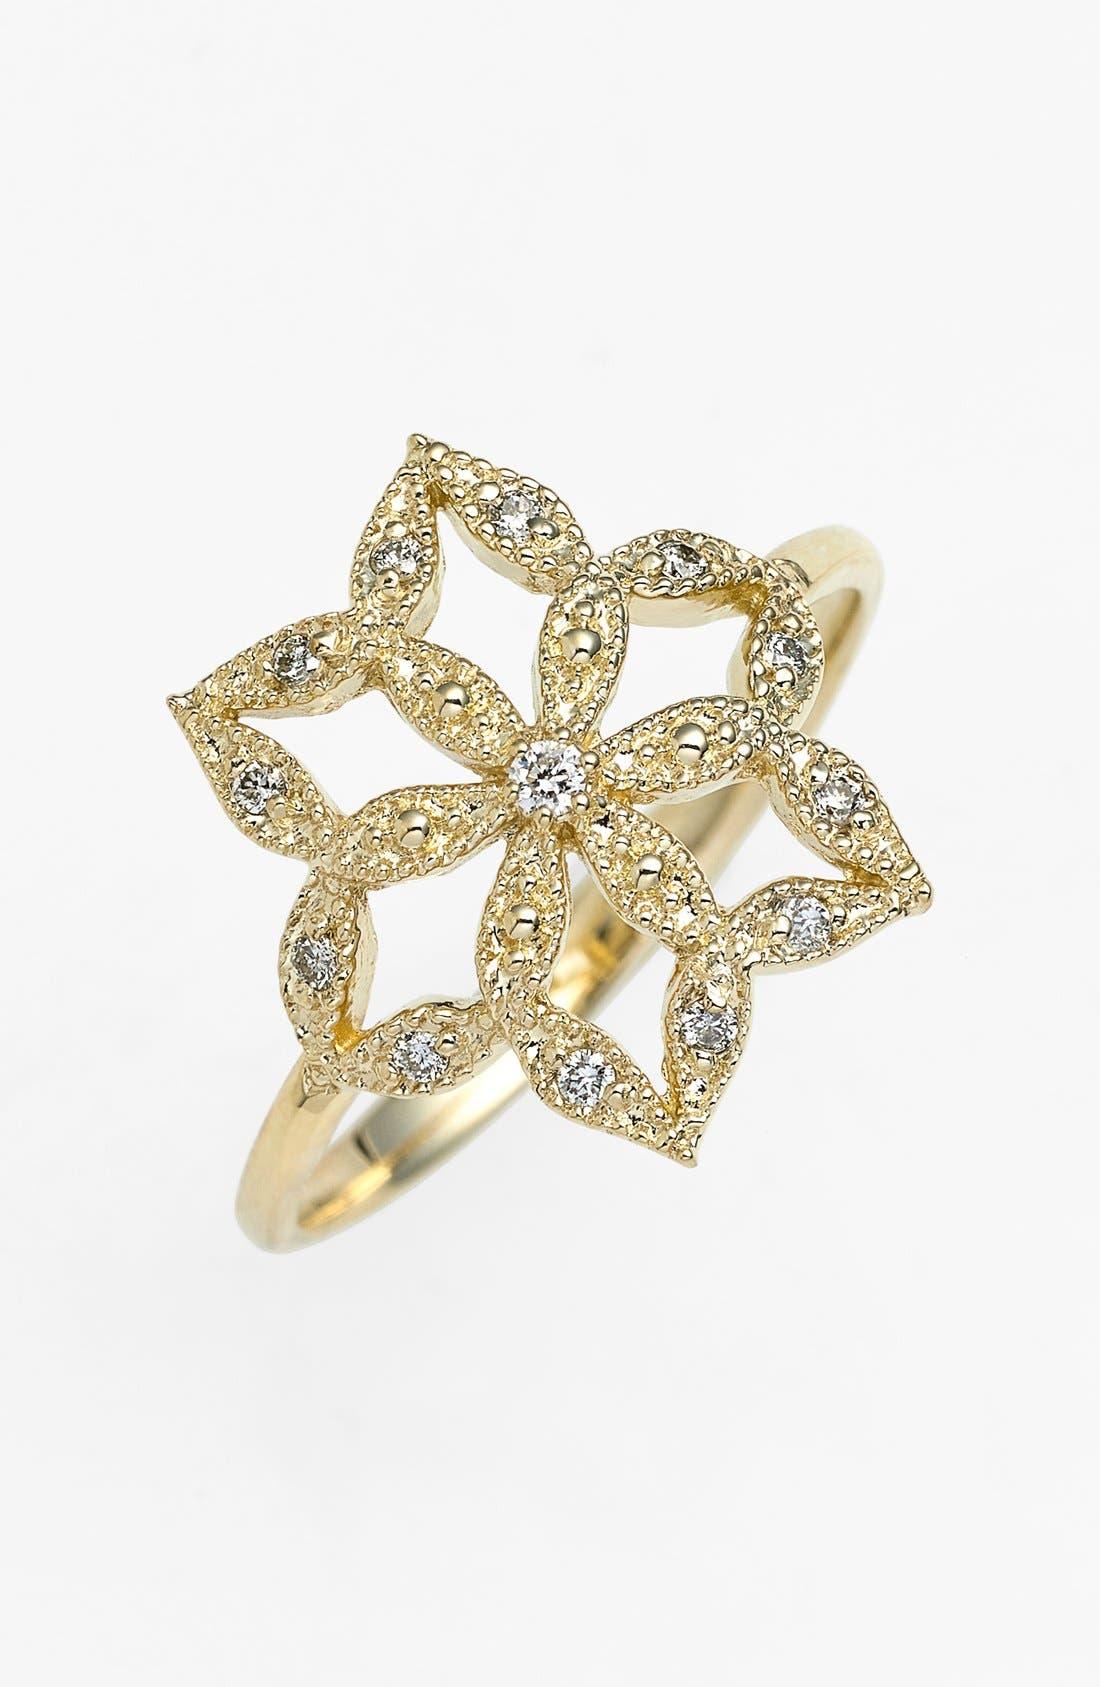 Alternate Image 1 Selected - Mizuki 'Sea of Beauty' Diamond Flower Cocktail Ring